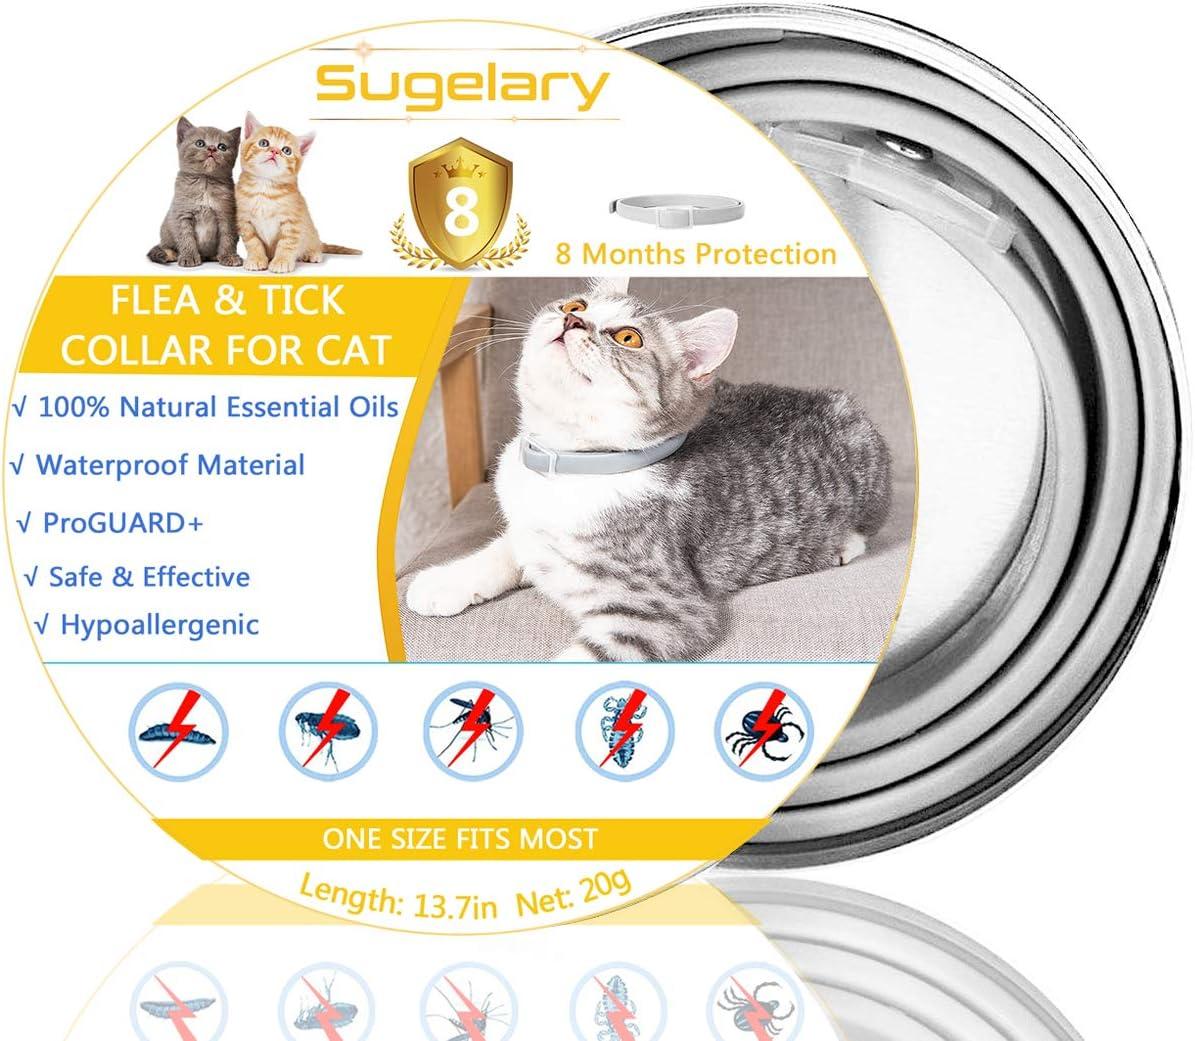 Sugelary Collar Antiparasitario para Mascotas Gatos Plagas Repelentes para Mascotas Agregado con Aceites Naturales, Tamaño Ajustable e Impermeable, Detiene Mordeduras y Picazón (2)